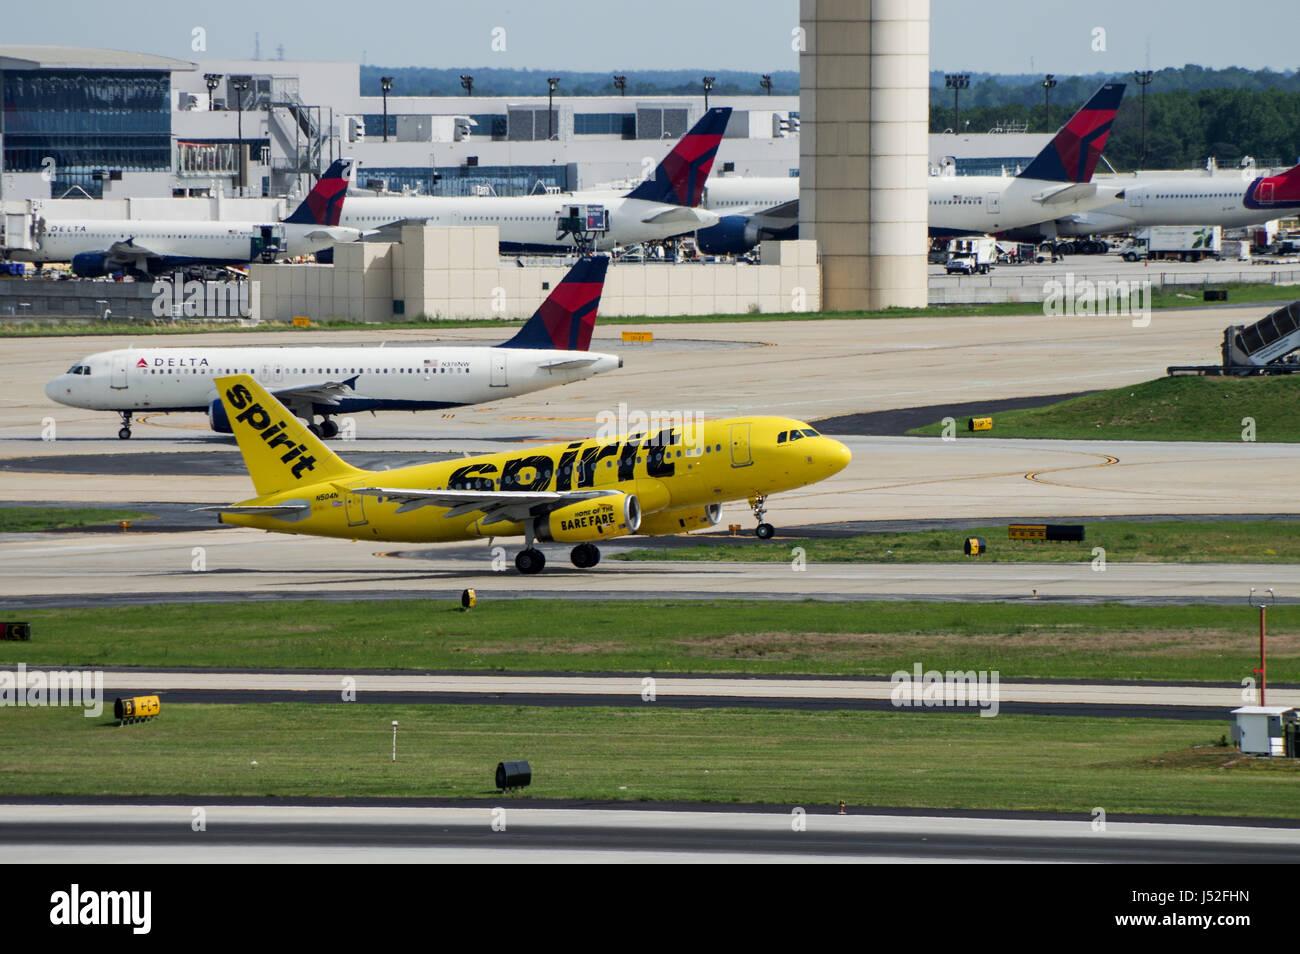 Spirit Airlines Airbus 319-100 taking off in Hartsfield–Jackson Atlanta International Airport - Stock Image